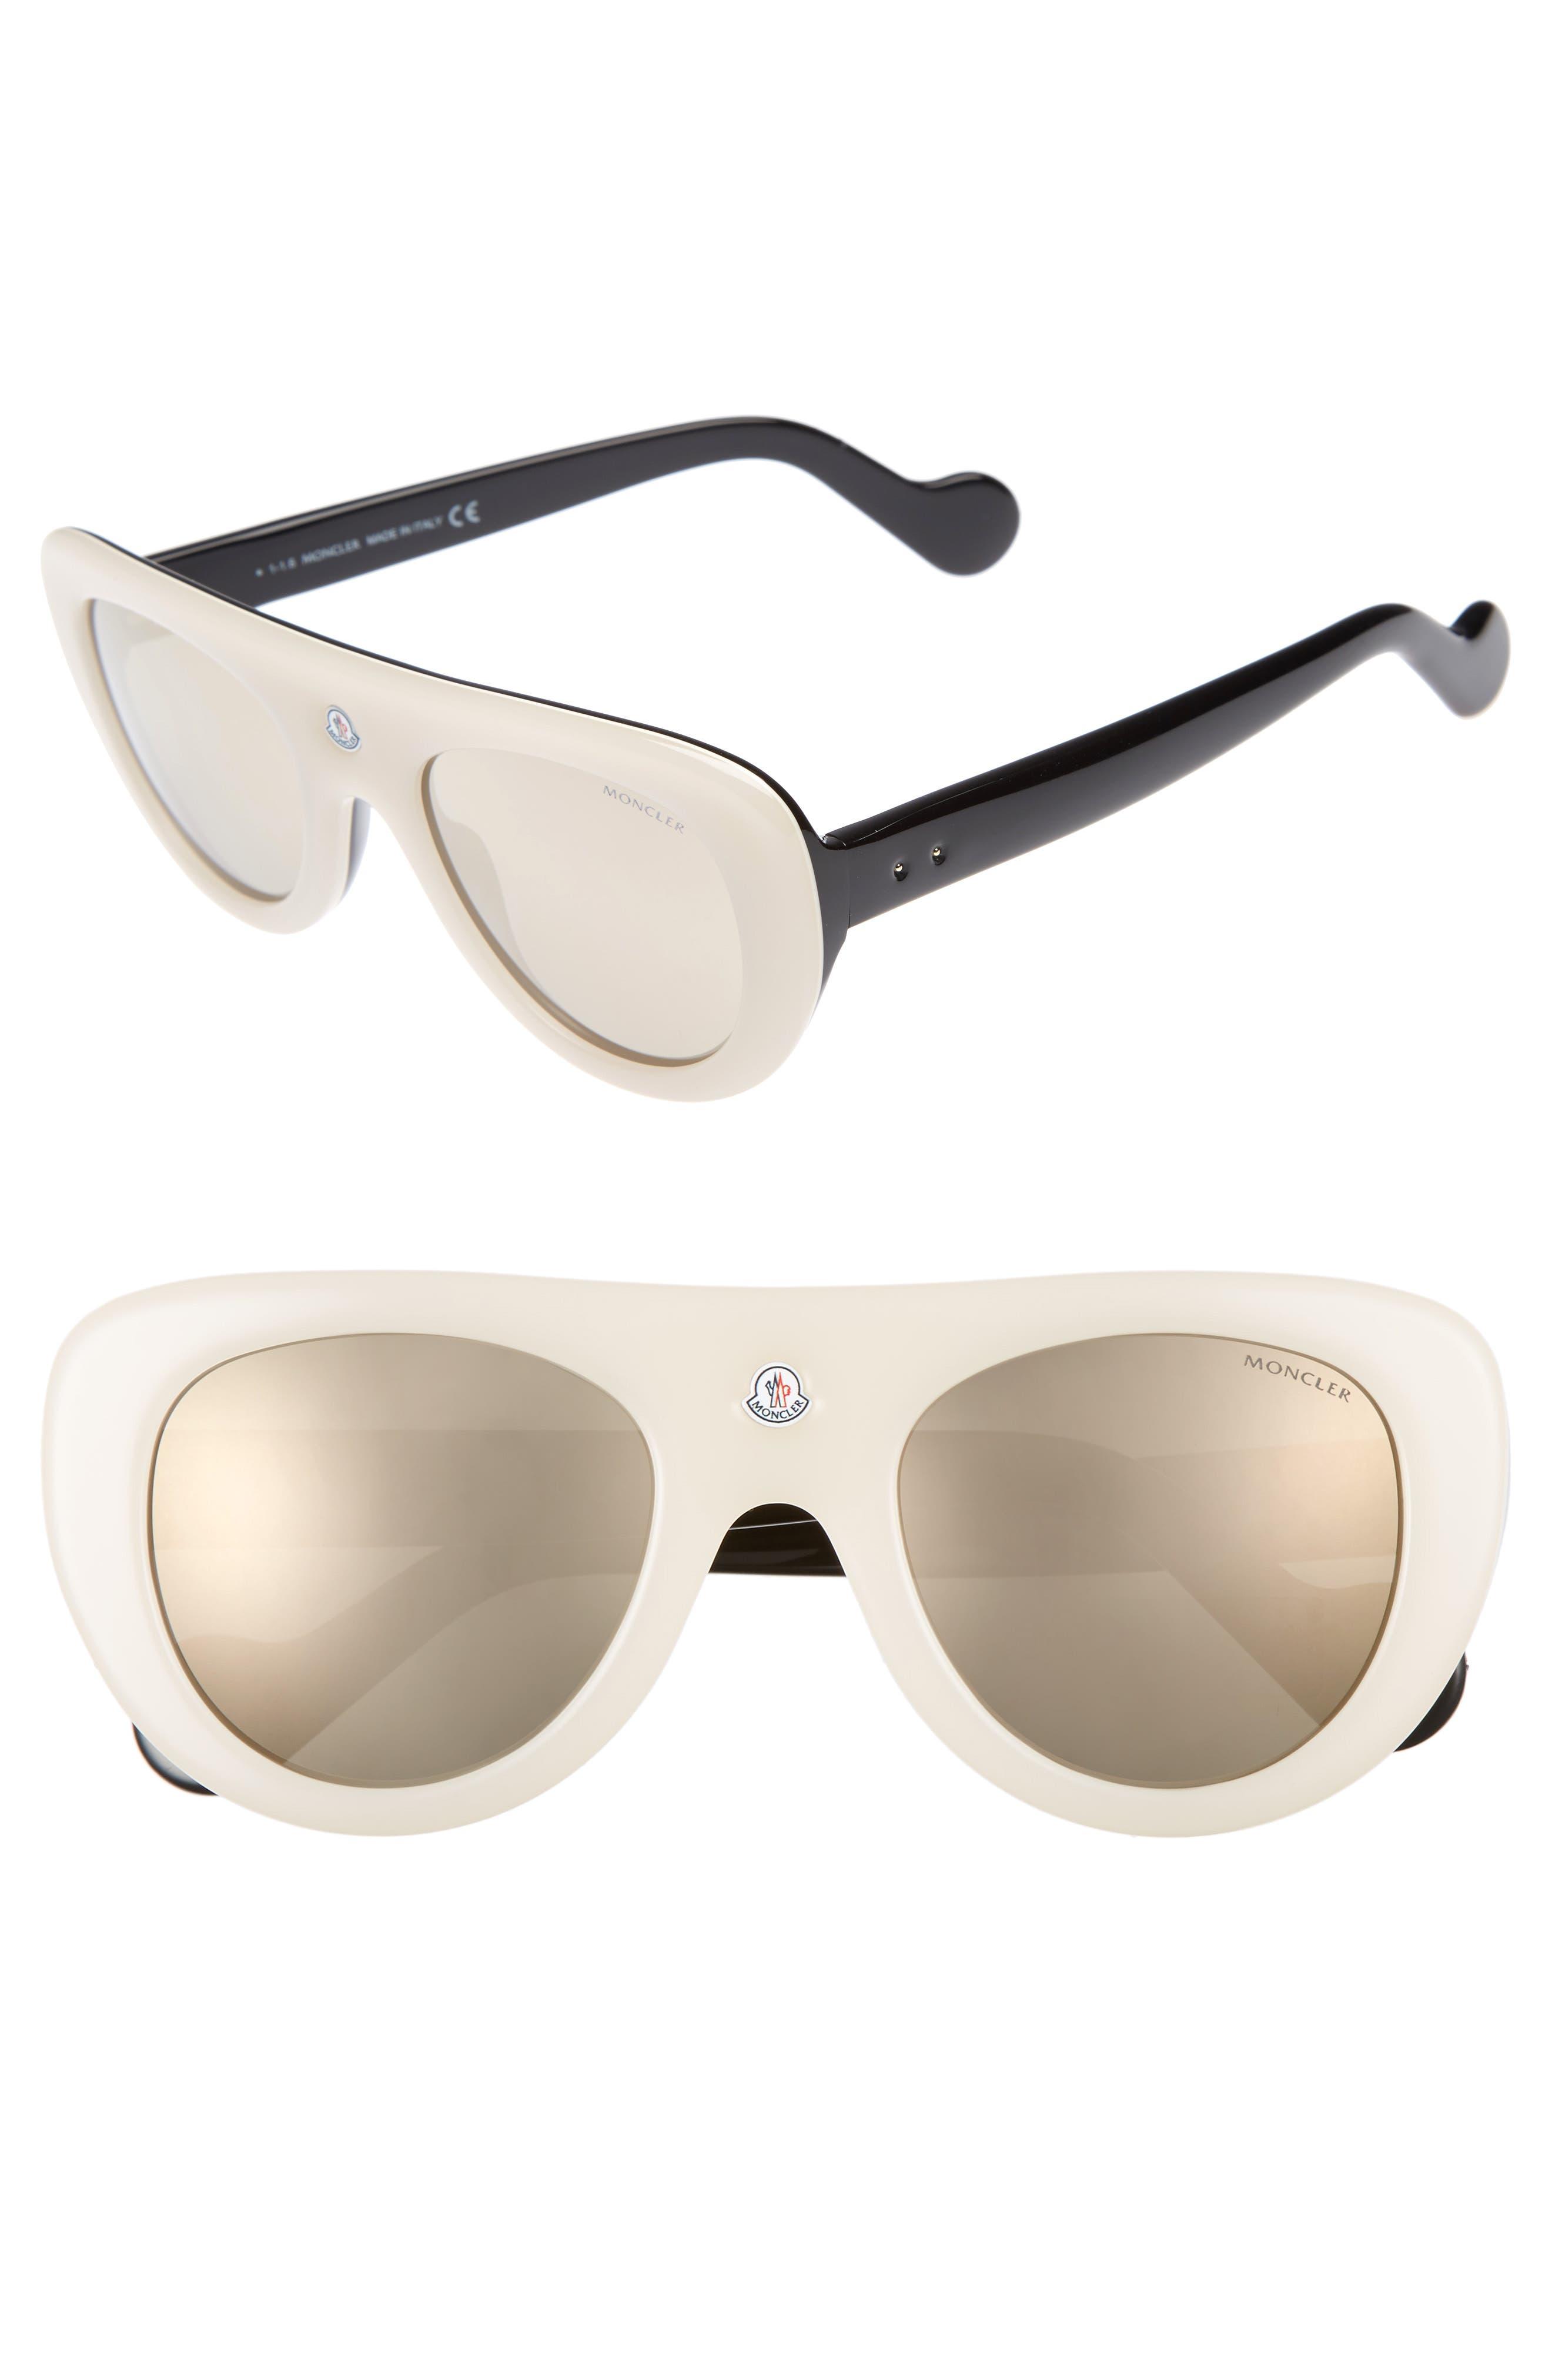 Main Image - Moncler 51mm Shield Sunglasses